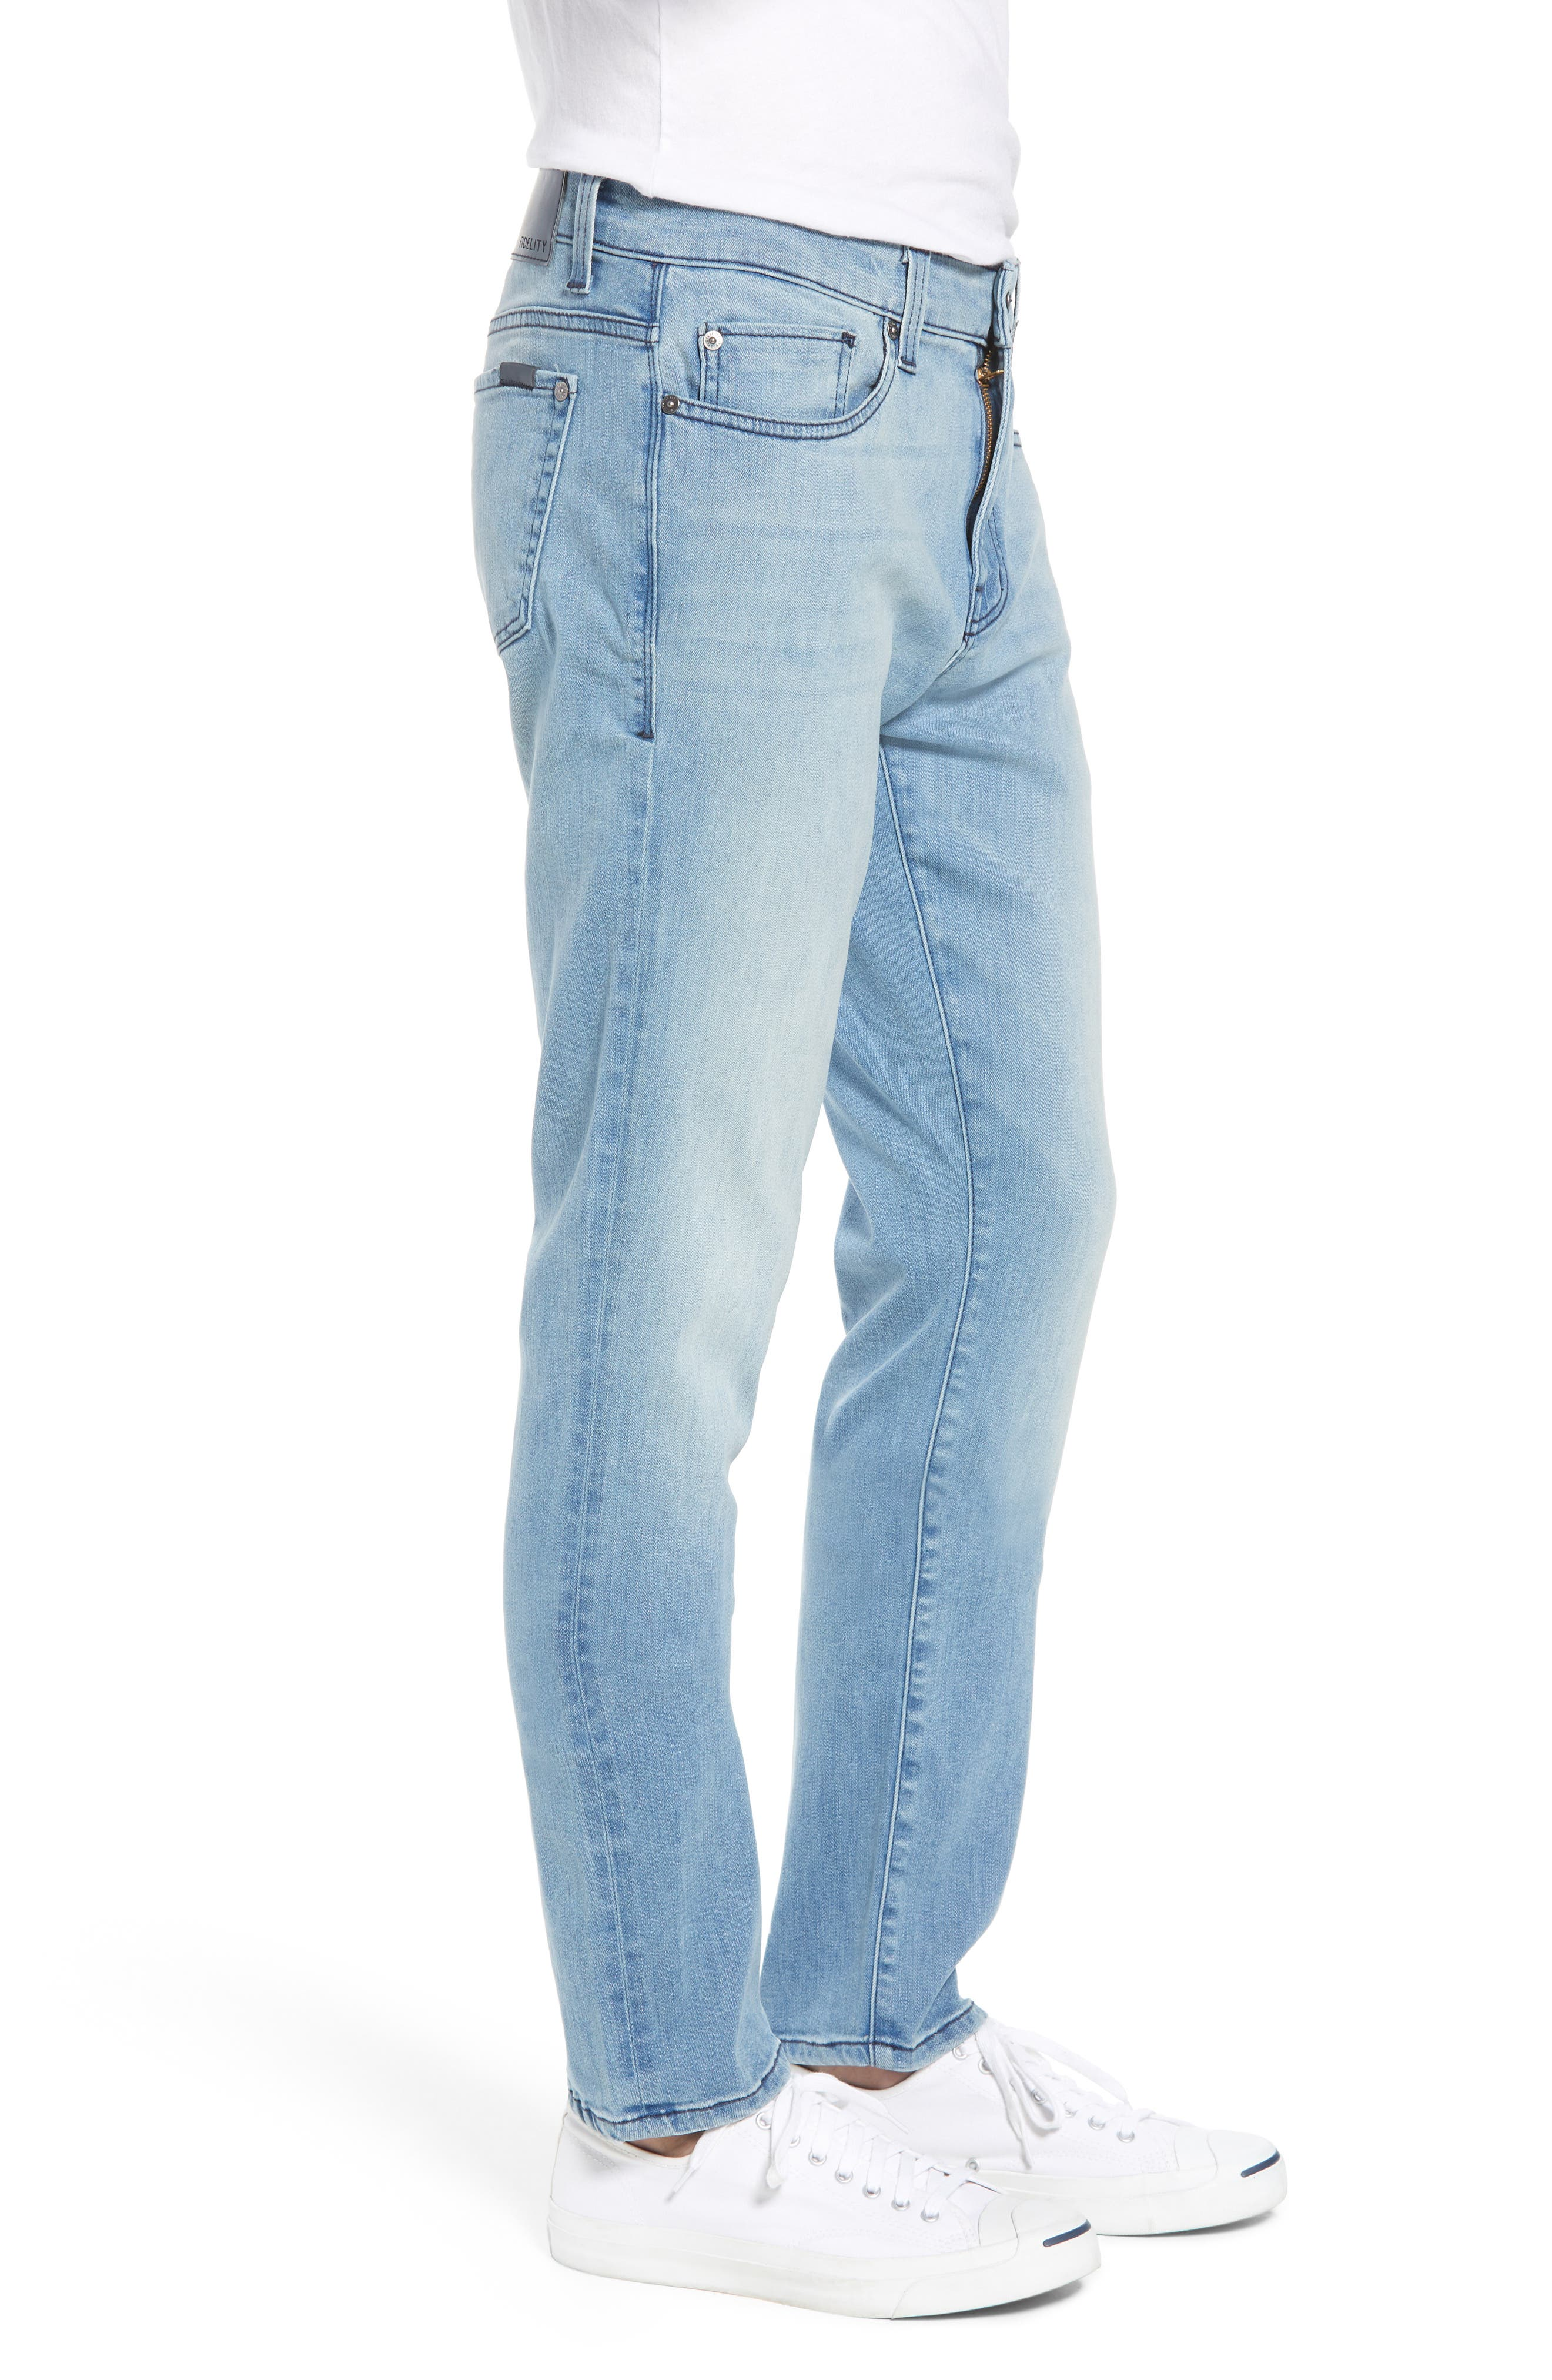 Torino Slim Fit Jeans,                             Alternate thumbnail 3, color,                             Abbey Blue